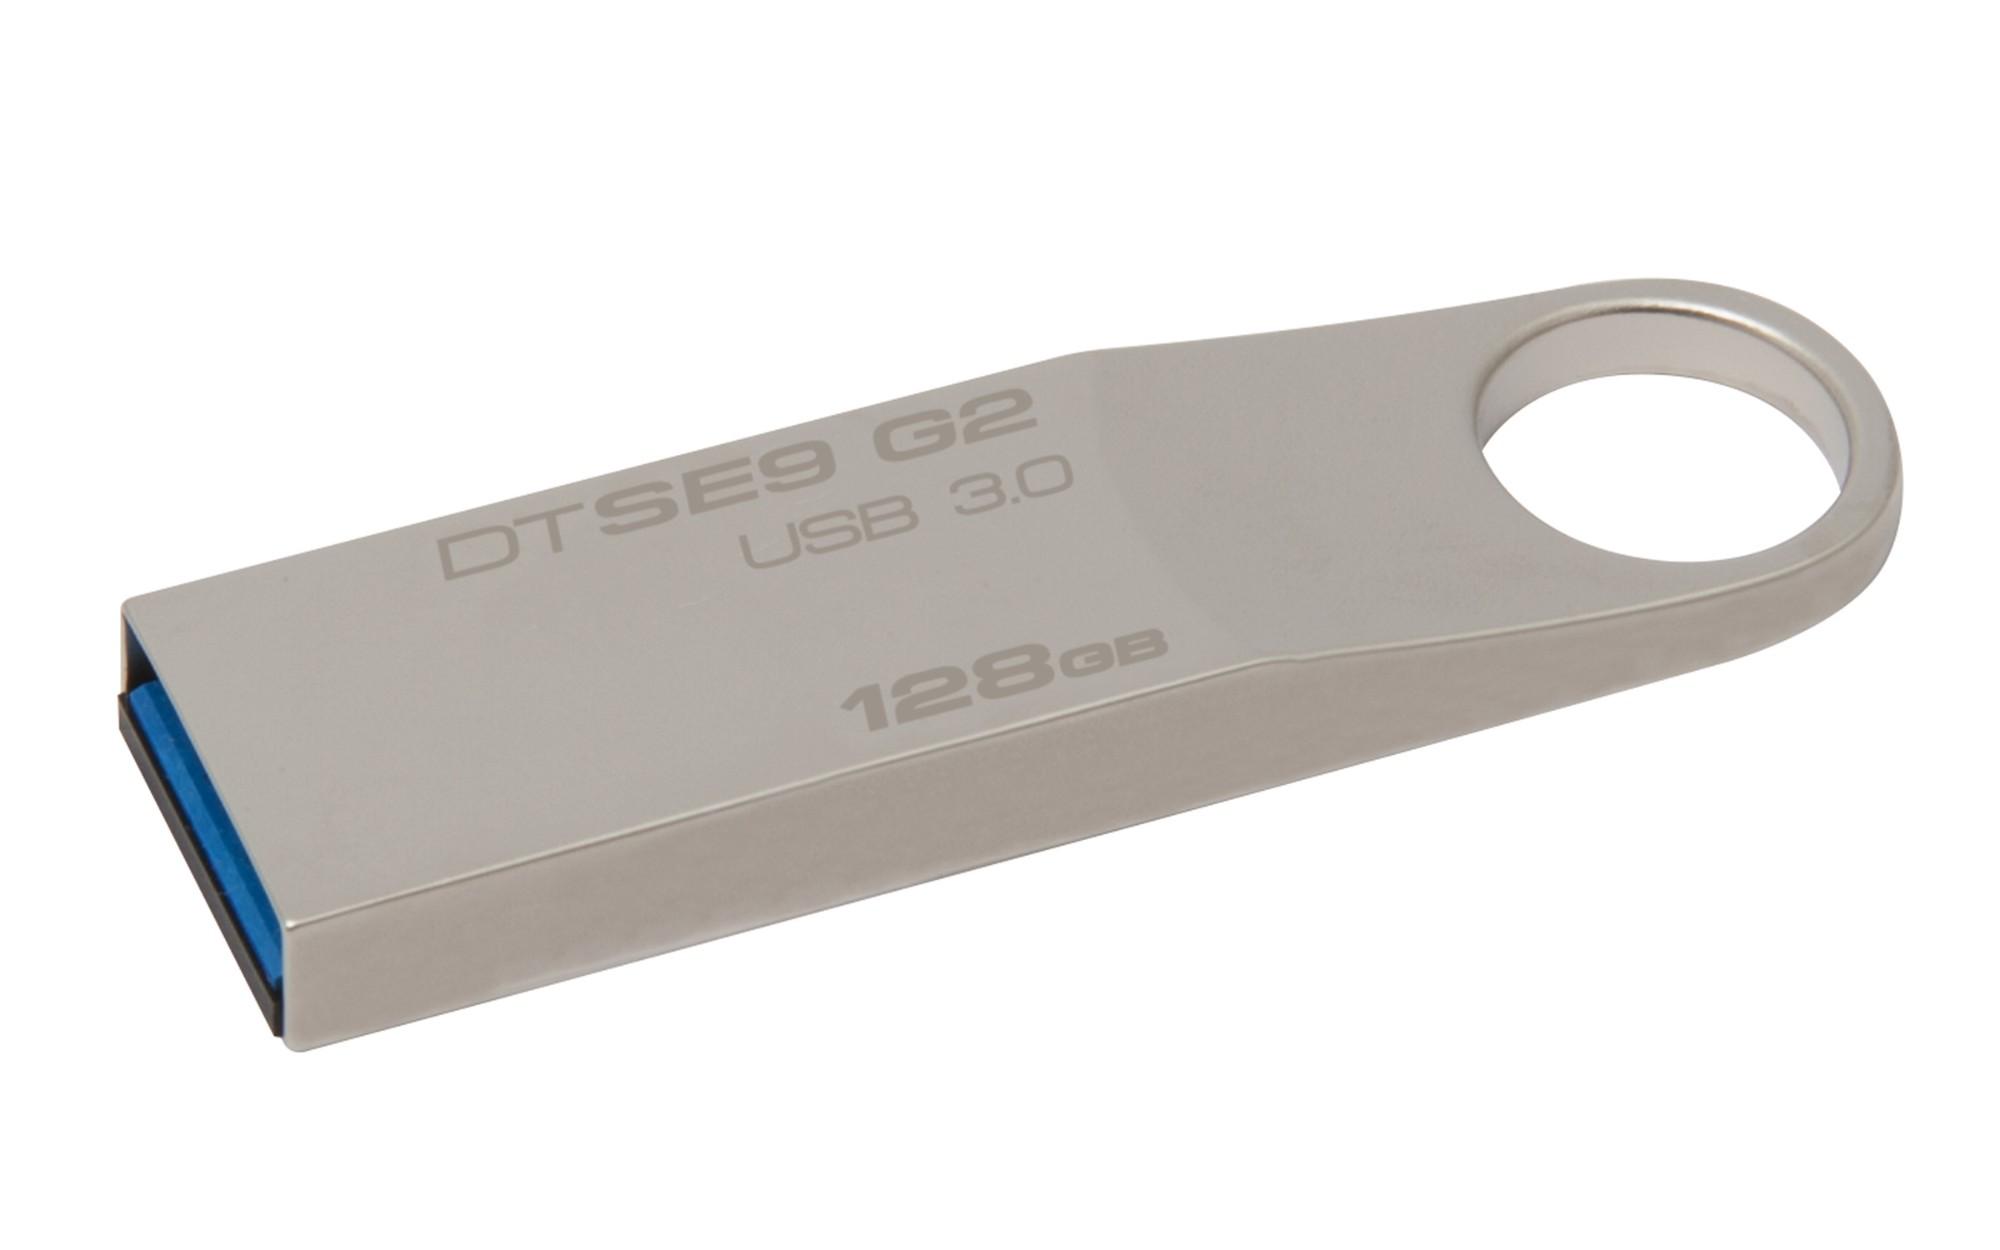 Kingston Technology DataTraveler SE9 G2 128GB USB flash drive 3.0 (3.1 Gen 1) USB Type-A connector Silver